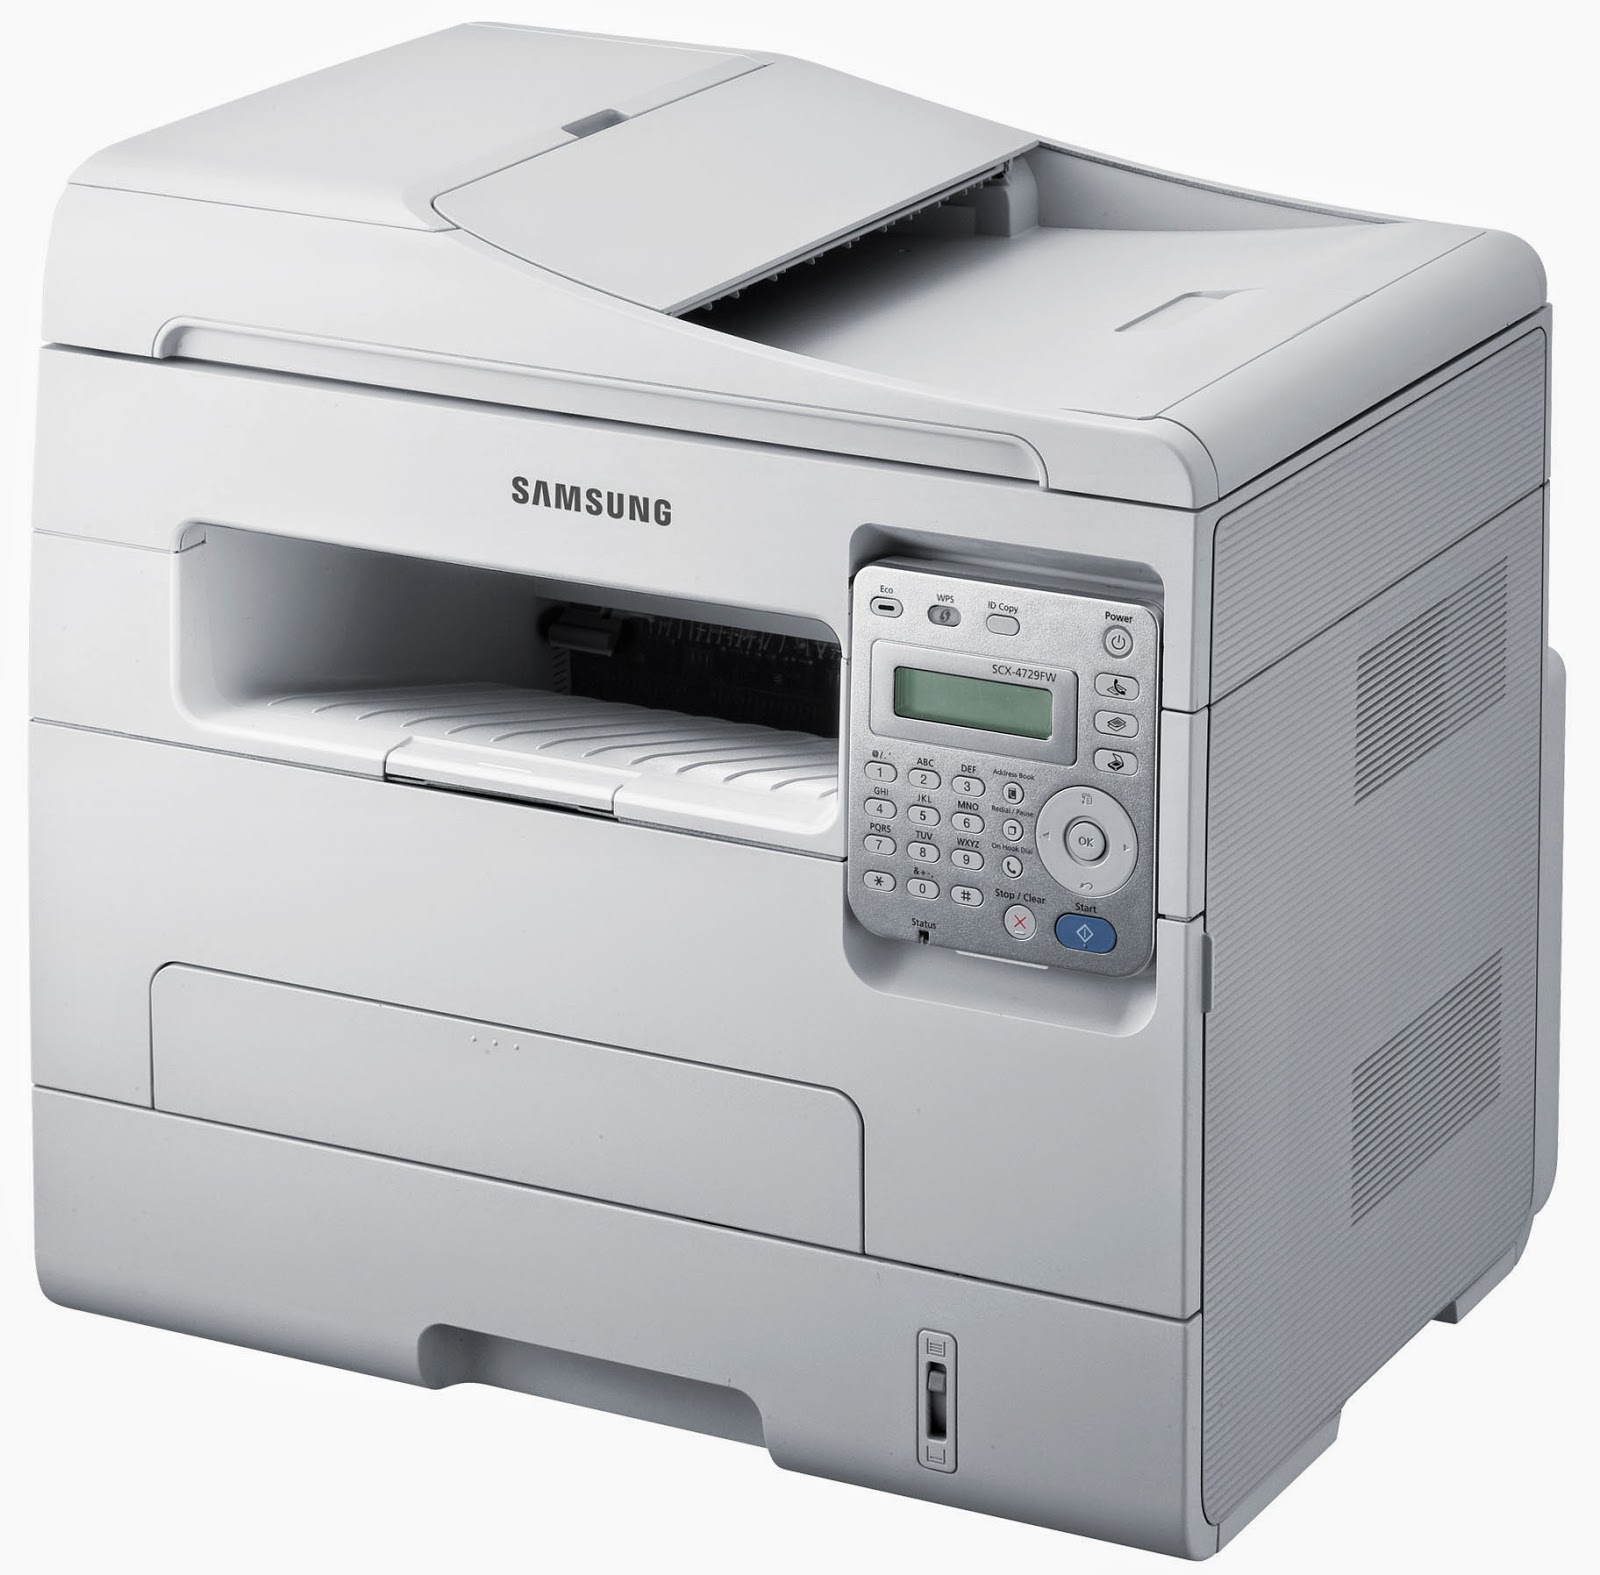 Samsung SCX-4729FW Driver Download